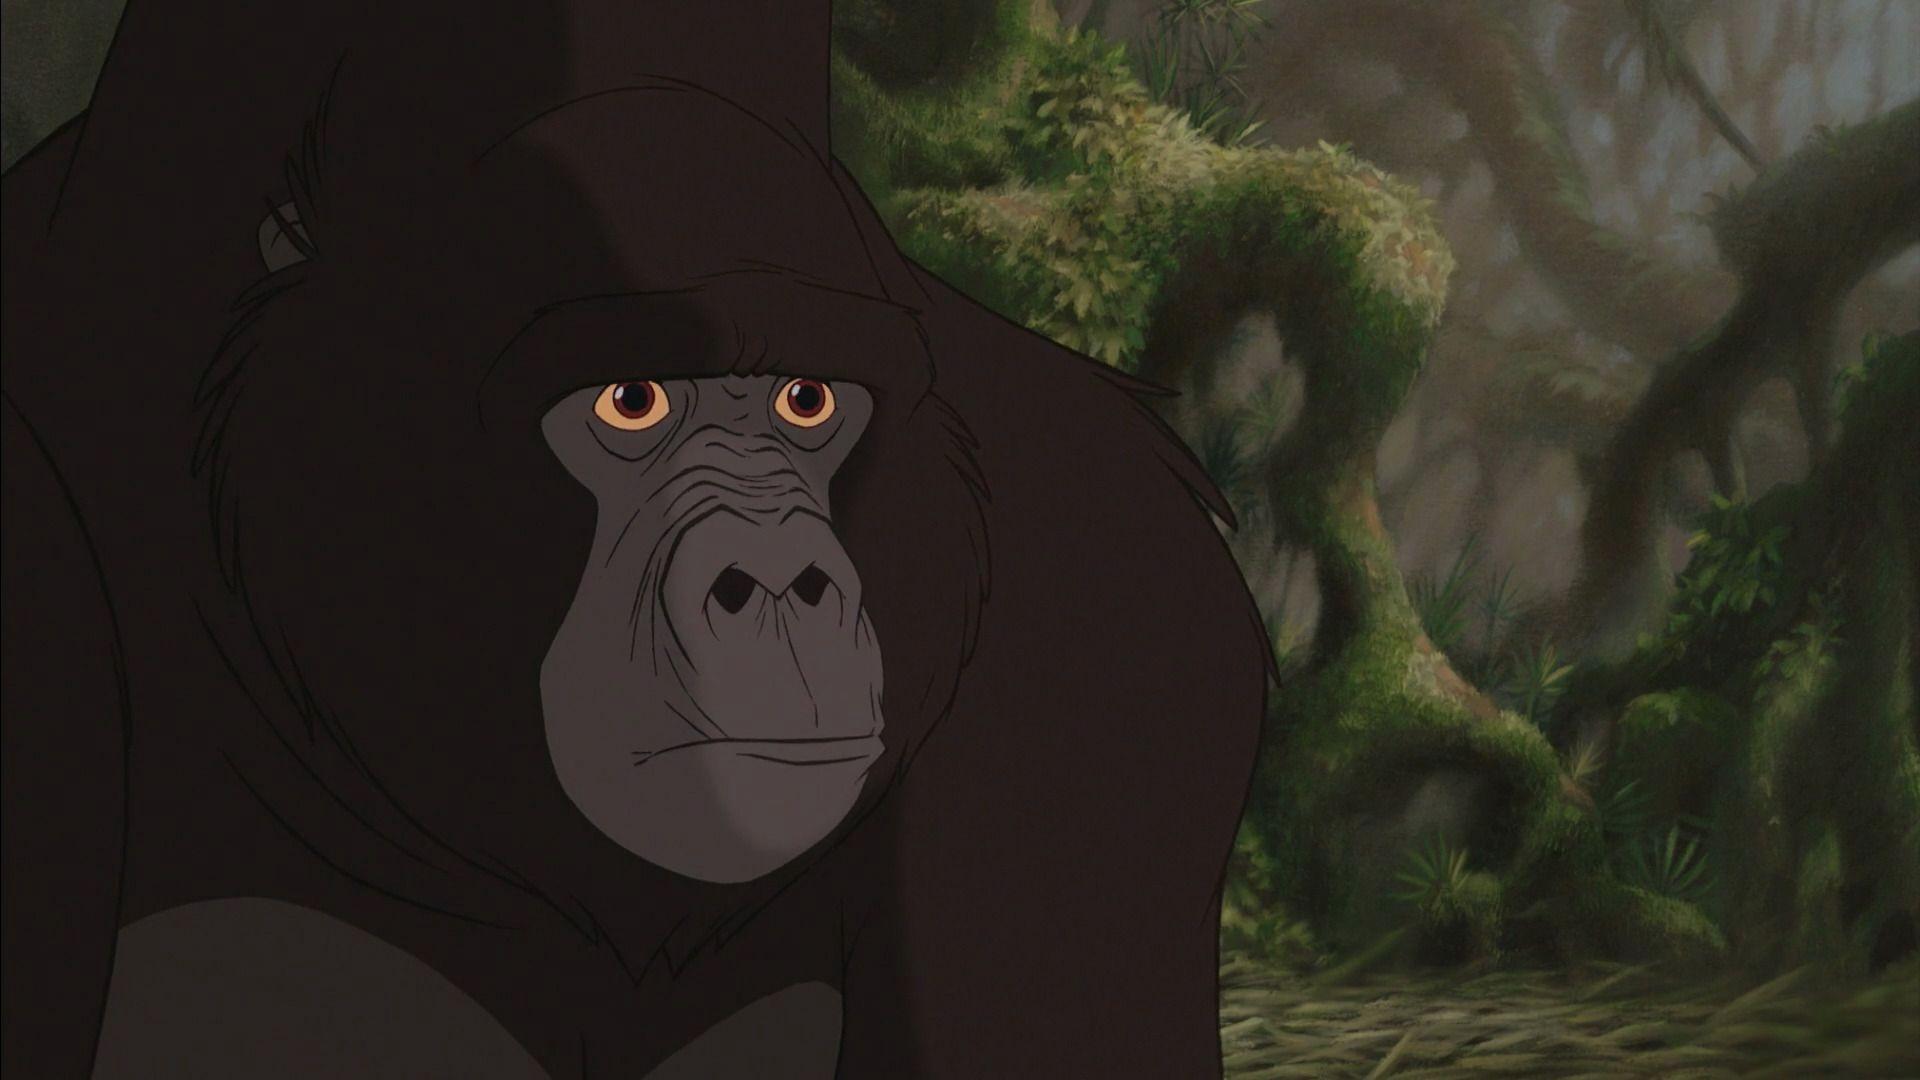 Kerchak tarzan and disney s - Tarzan gorille ...